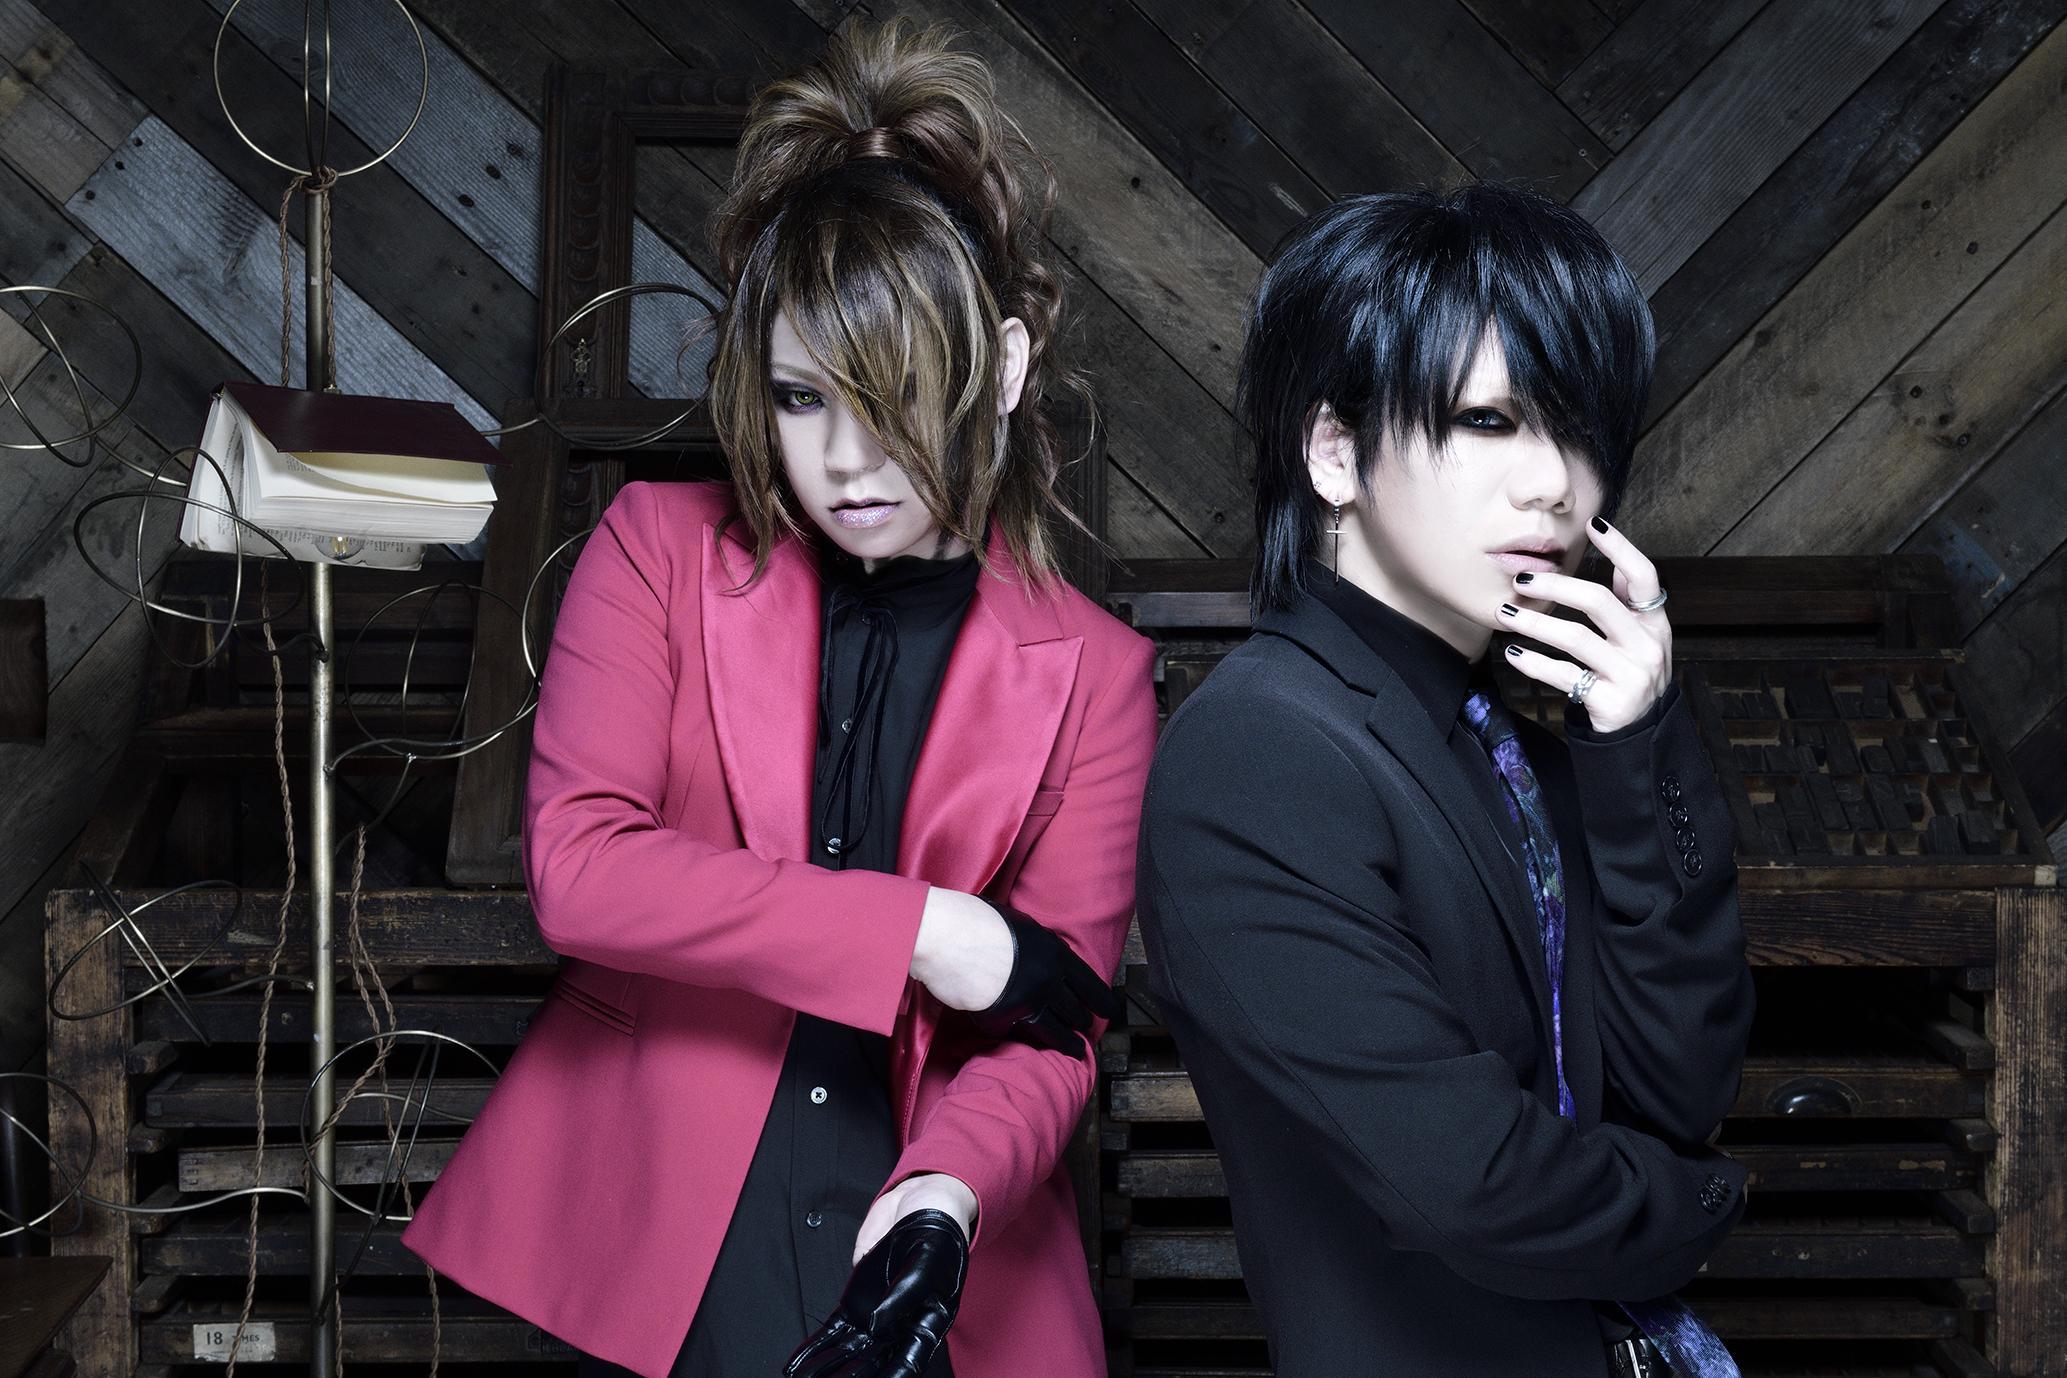 The THIRTEEN 結成5周年記念ライブ 「Fear kills growth」開催決定!モバイル会員先行チケット受付実施中!